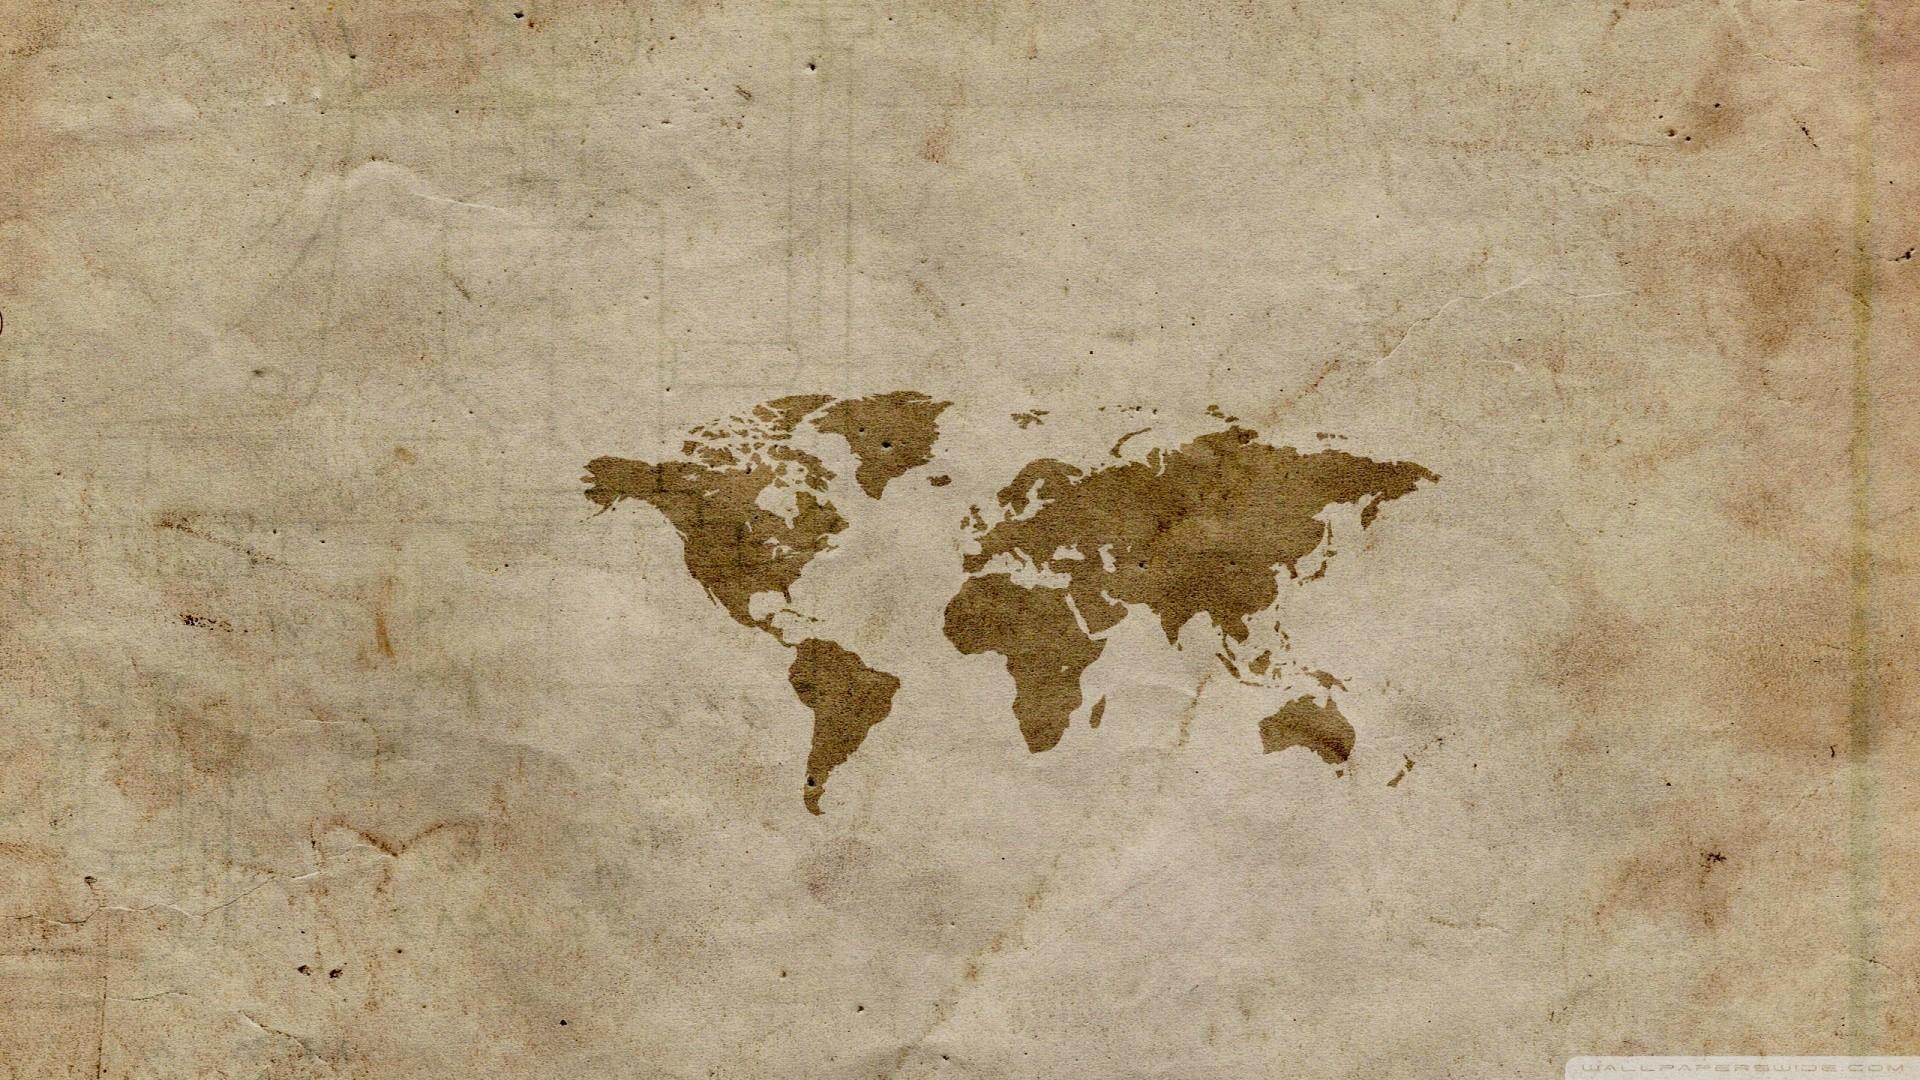 1920x1200 Explore World Map Wallpaper, Windows Wallpaper, And More!